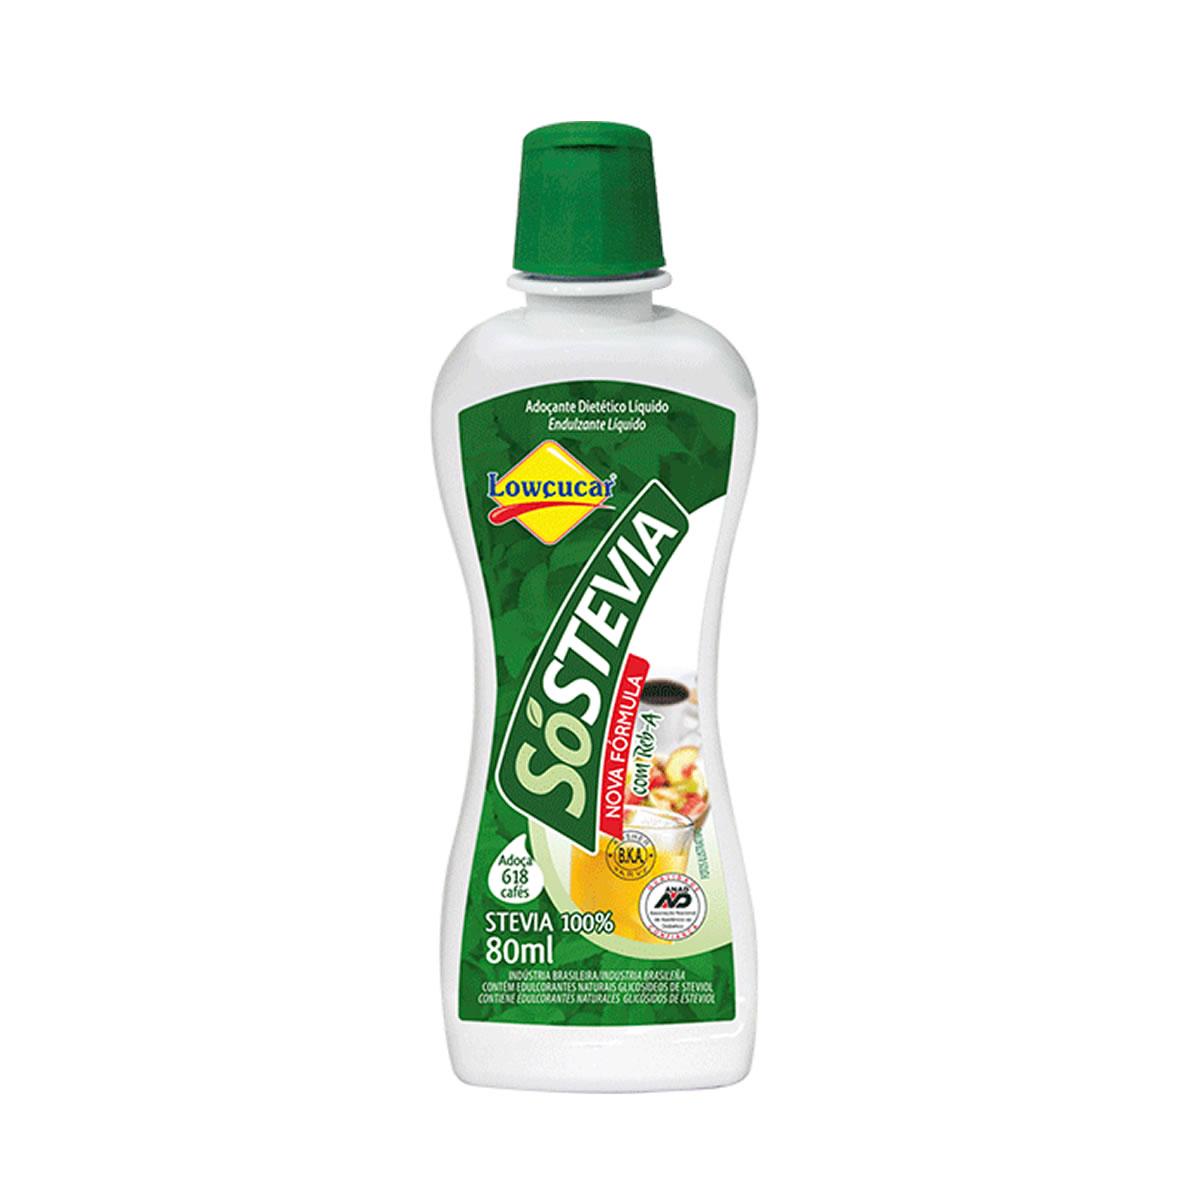 Adoçante 100% Stevia Liquido SóStevia 80ml - Lowçucar